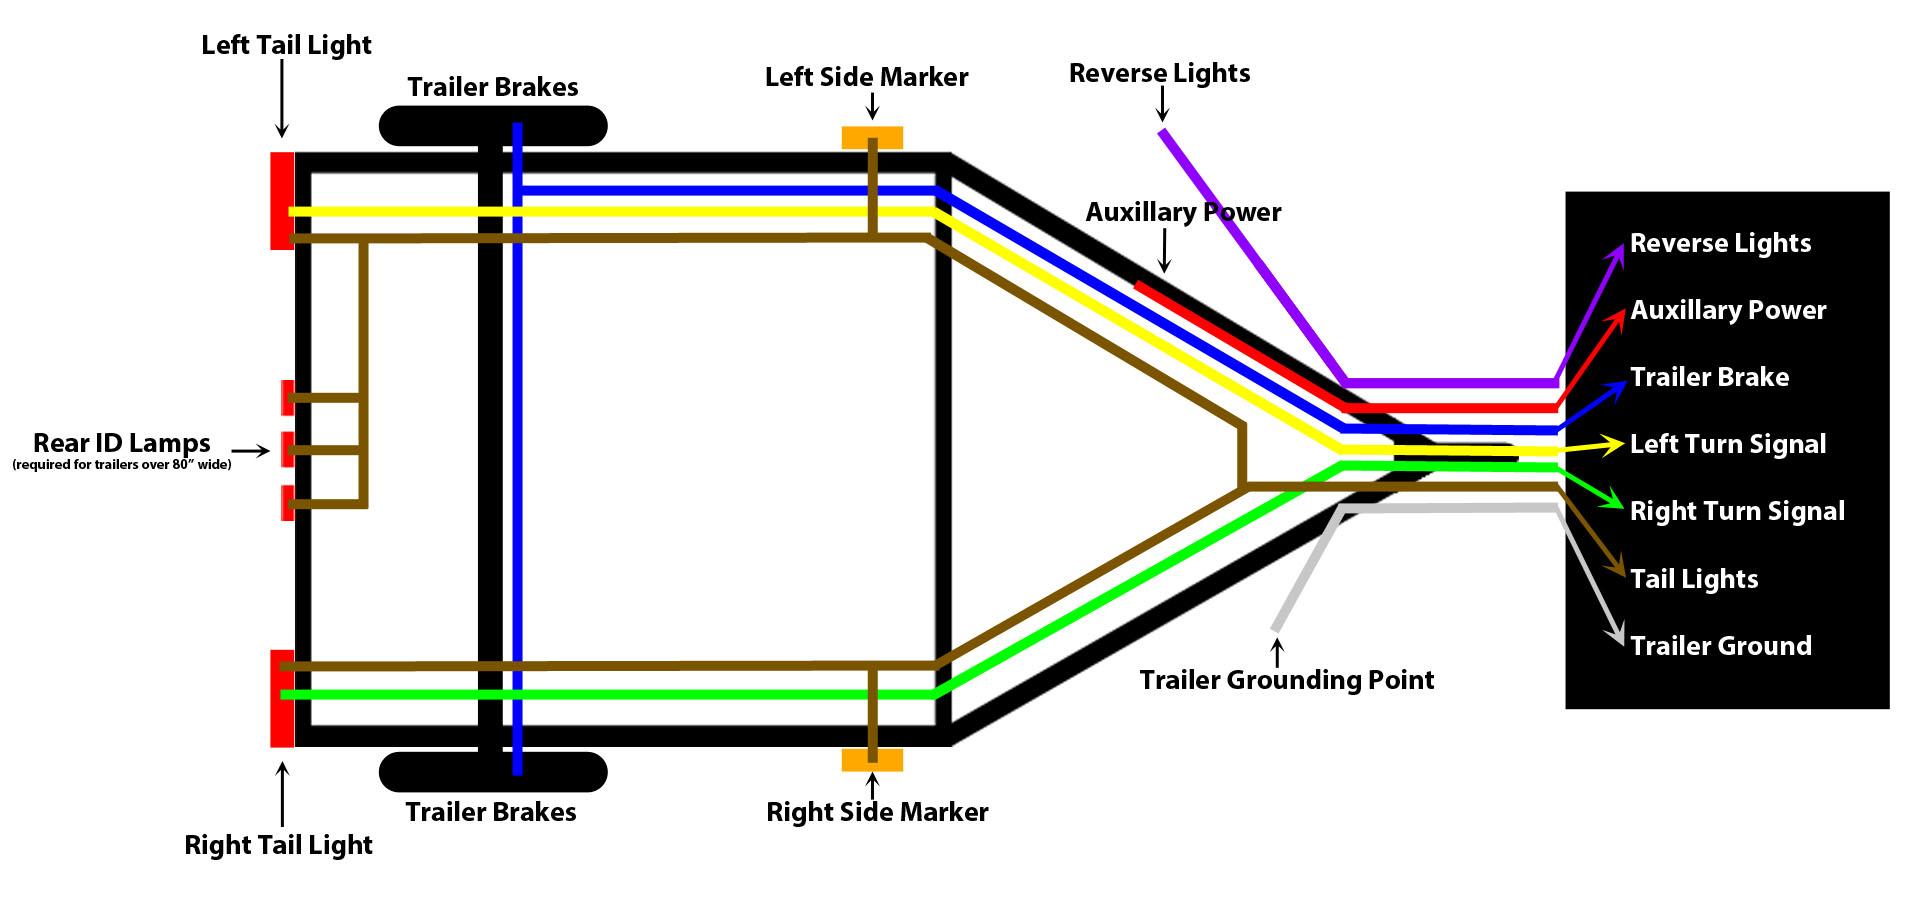 kiefer horse trailer wiring diagram wiring diagramkiefer horse trailer wiring diagram simple wiring diagram todaycircle j horse trailer wiring diagram simple wiring